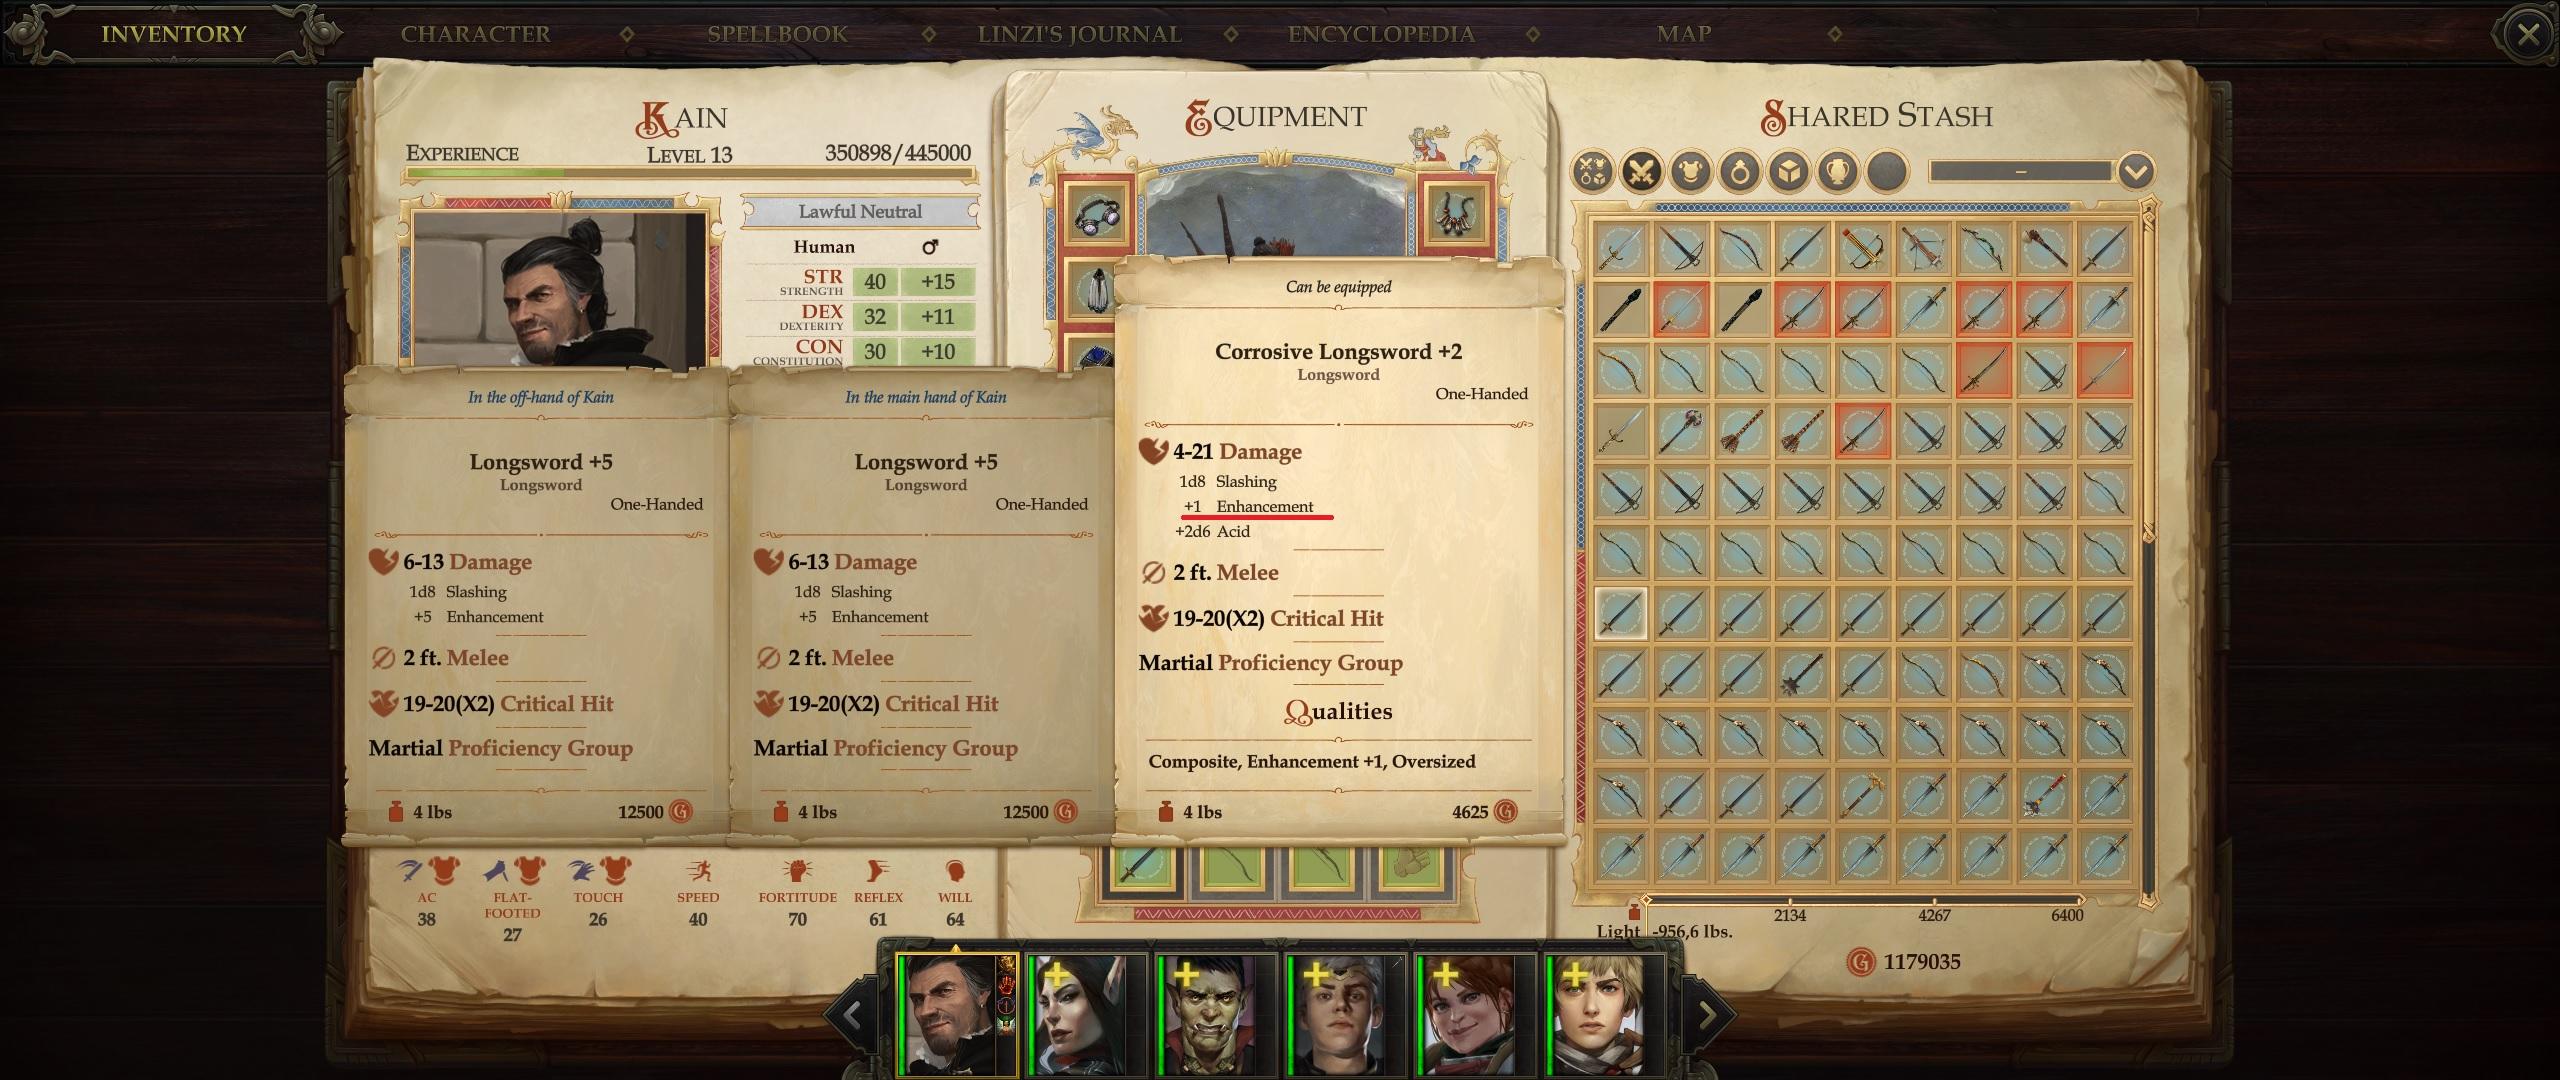 Steam Community :: Guide :: Pathfinder: Kingmaker cheat